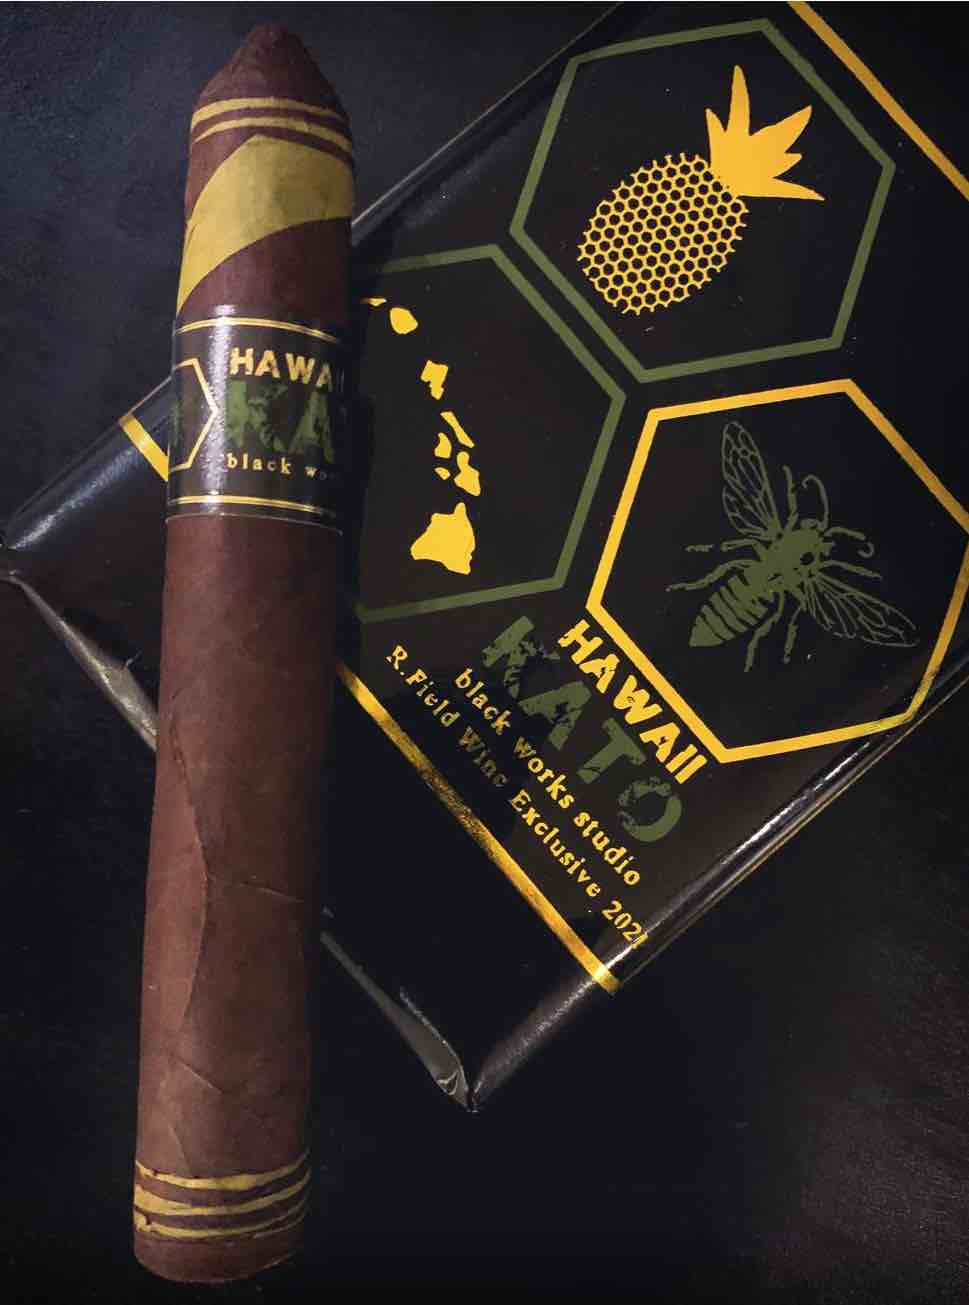 Cigar News: Black Works Studio Hawaii Kato Returns